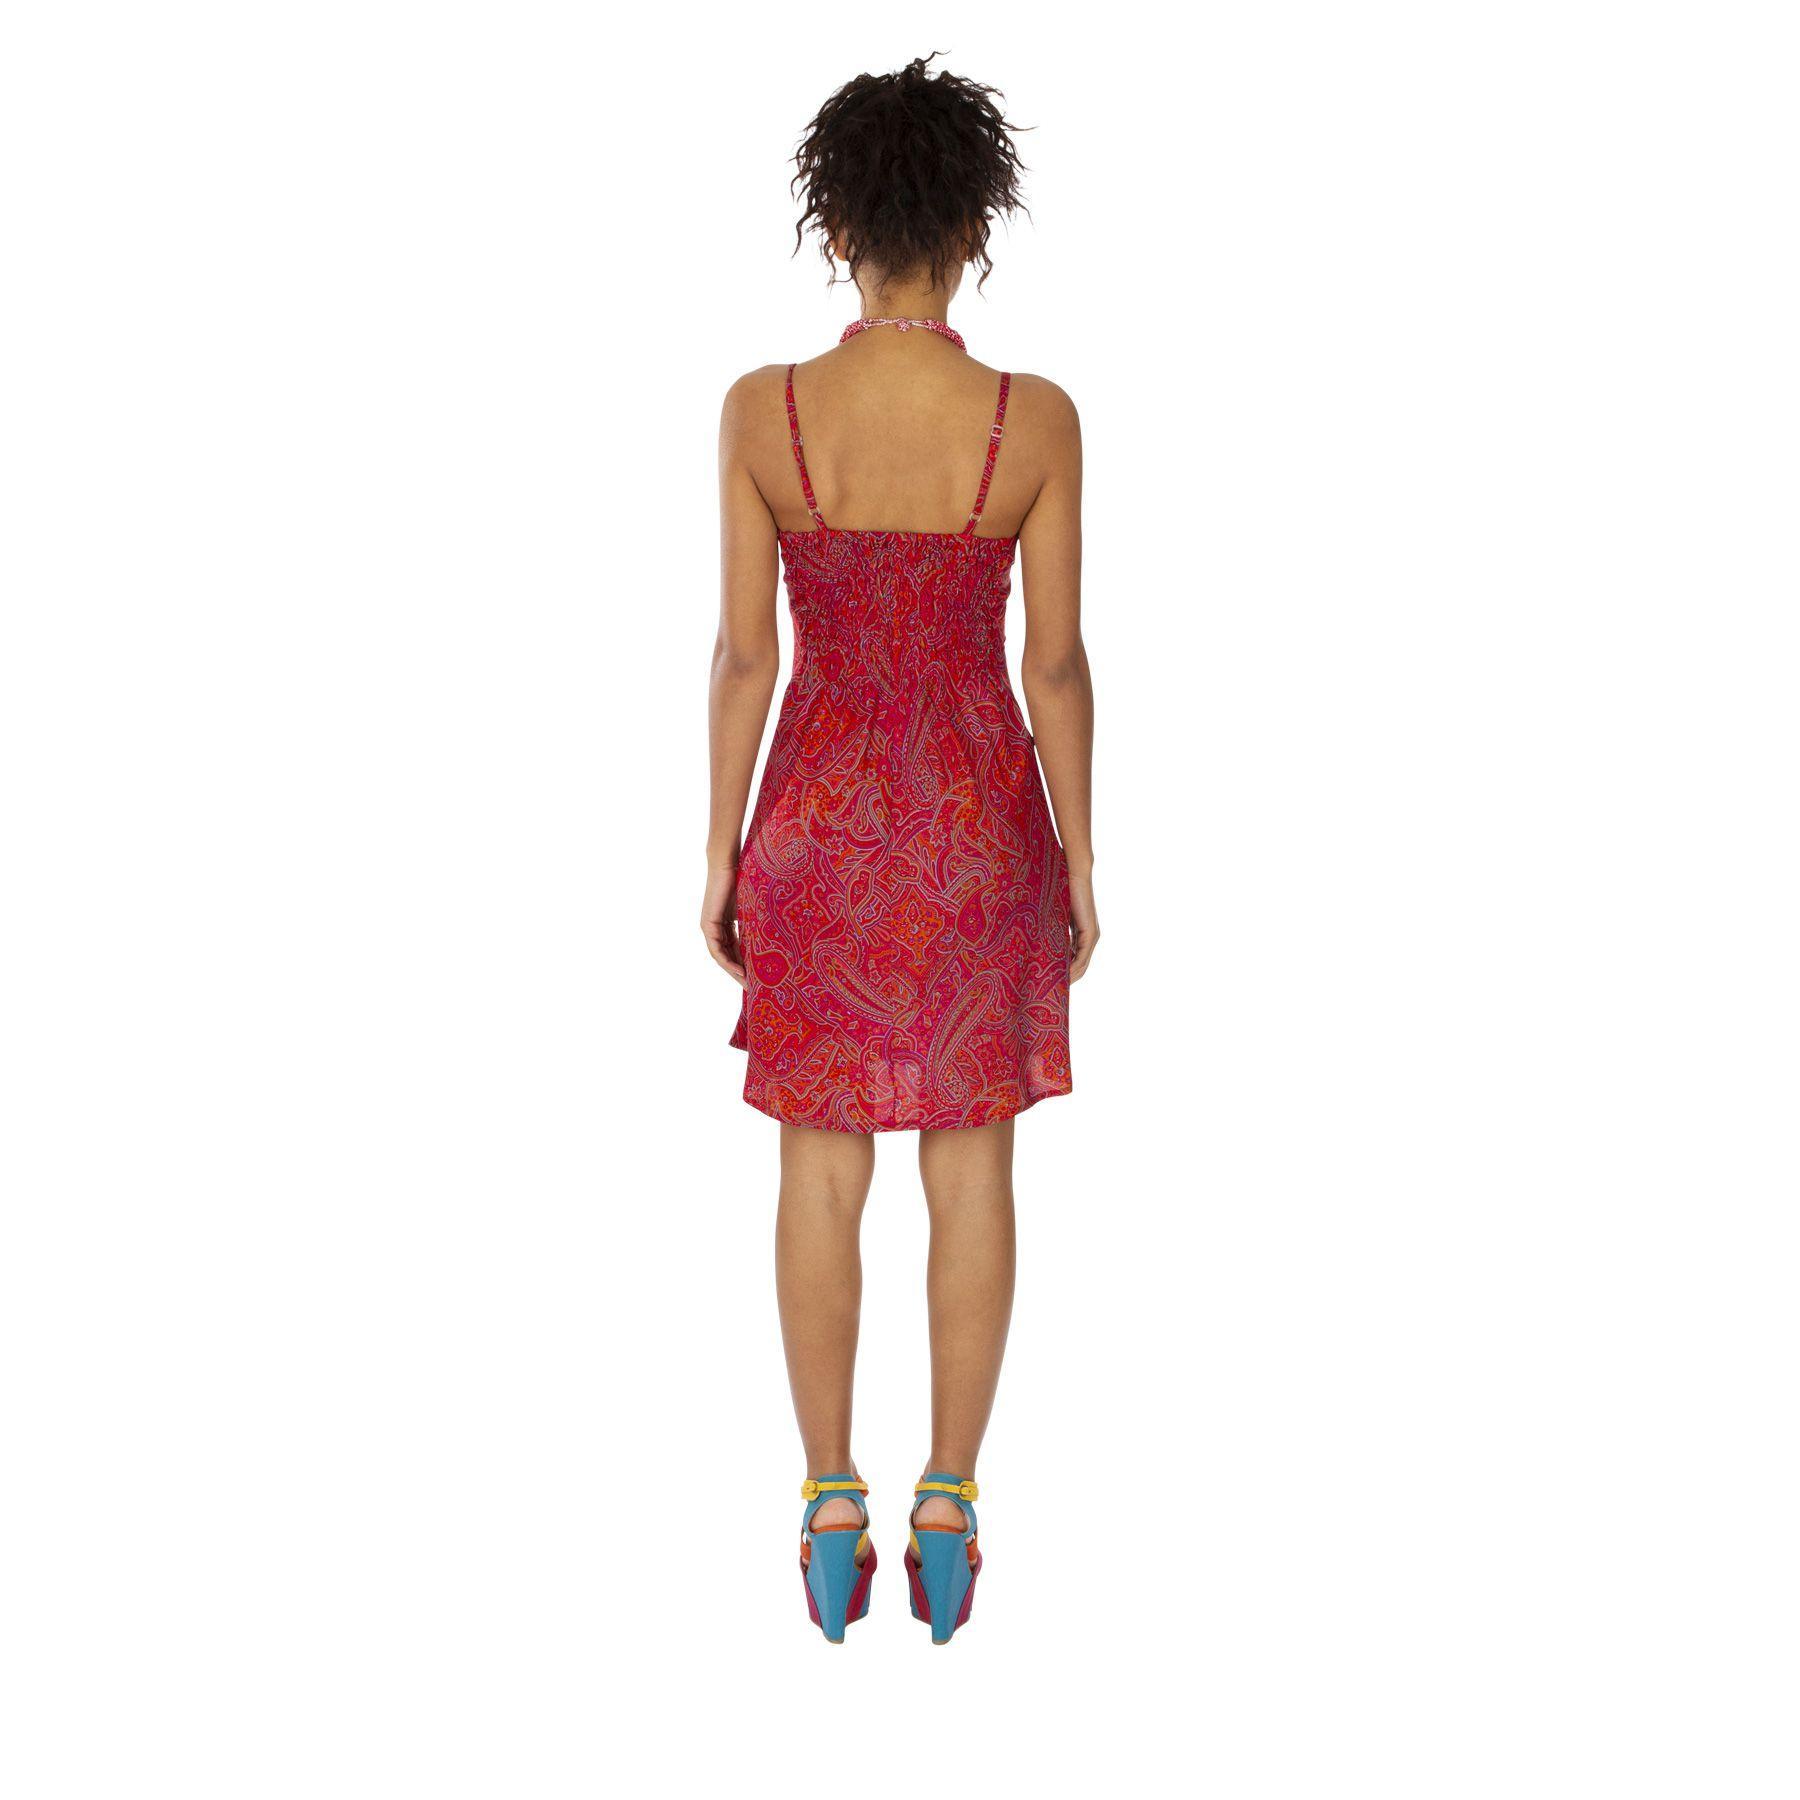 Robe caraco courte robe été façon nuisette Willa